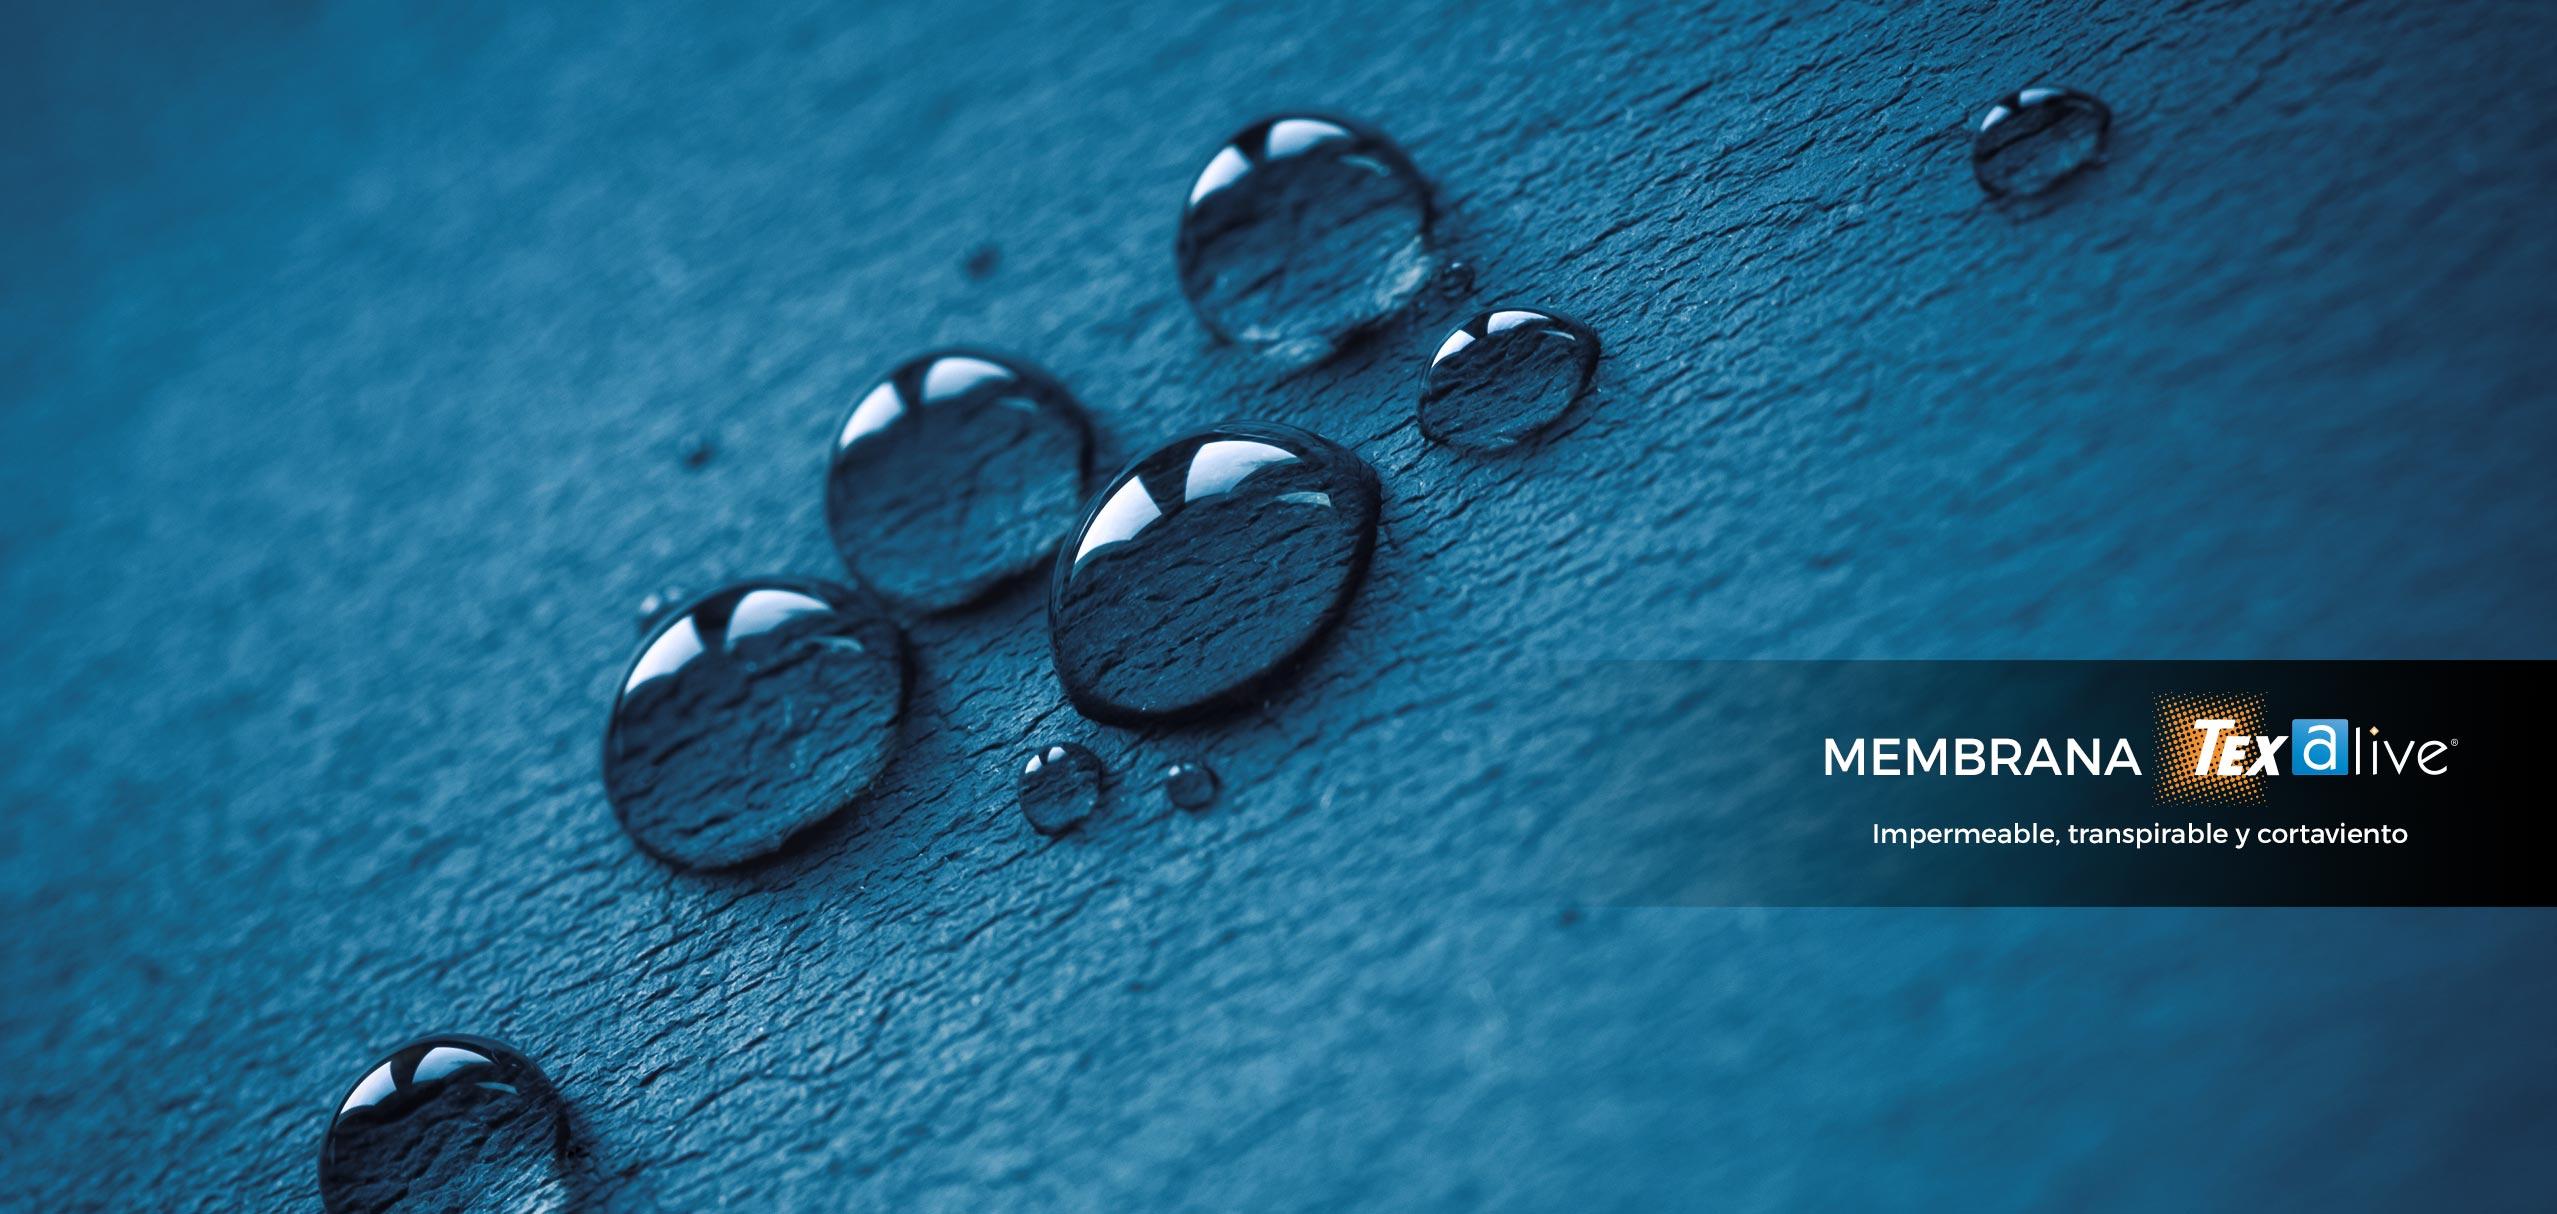 Membrana Texalive | Impermeable, transpirable y cortaviento